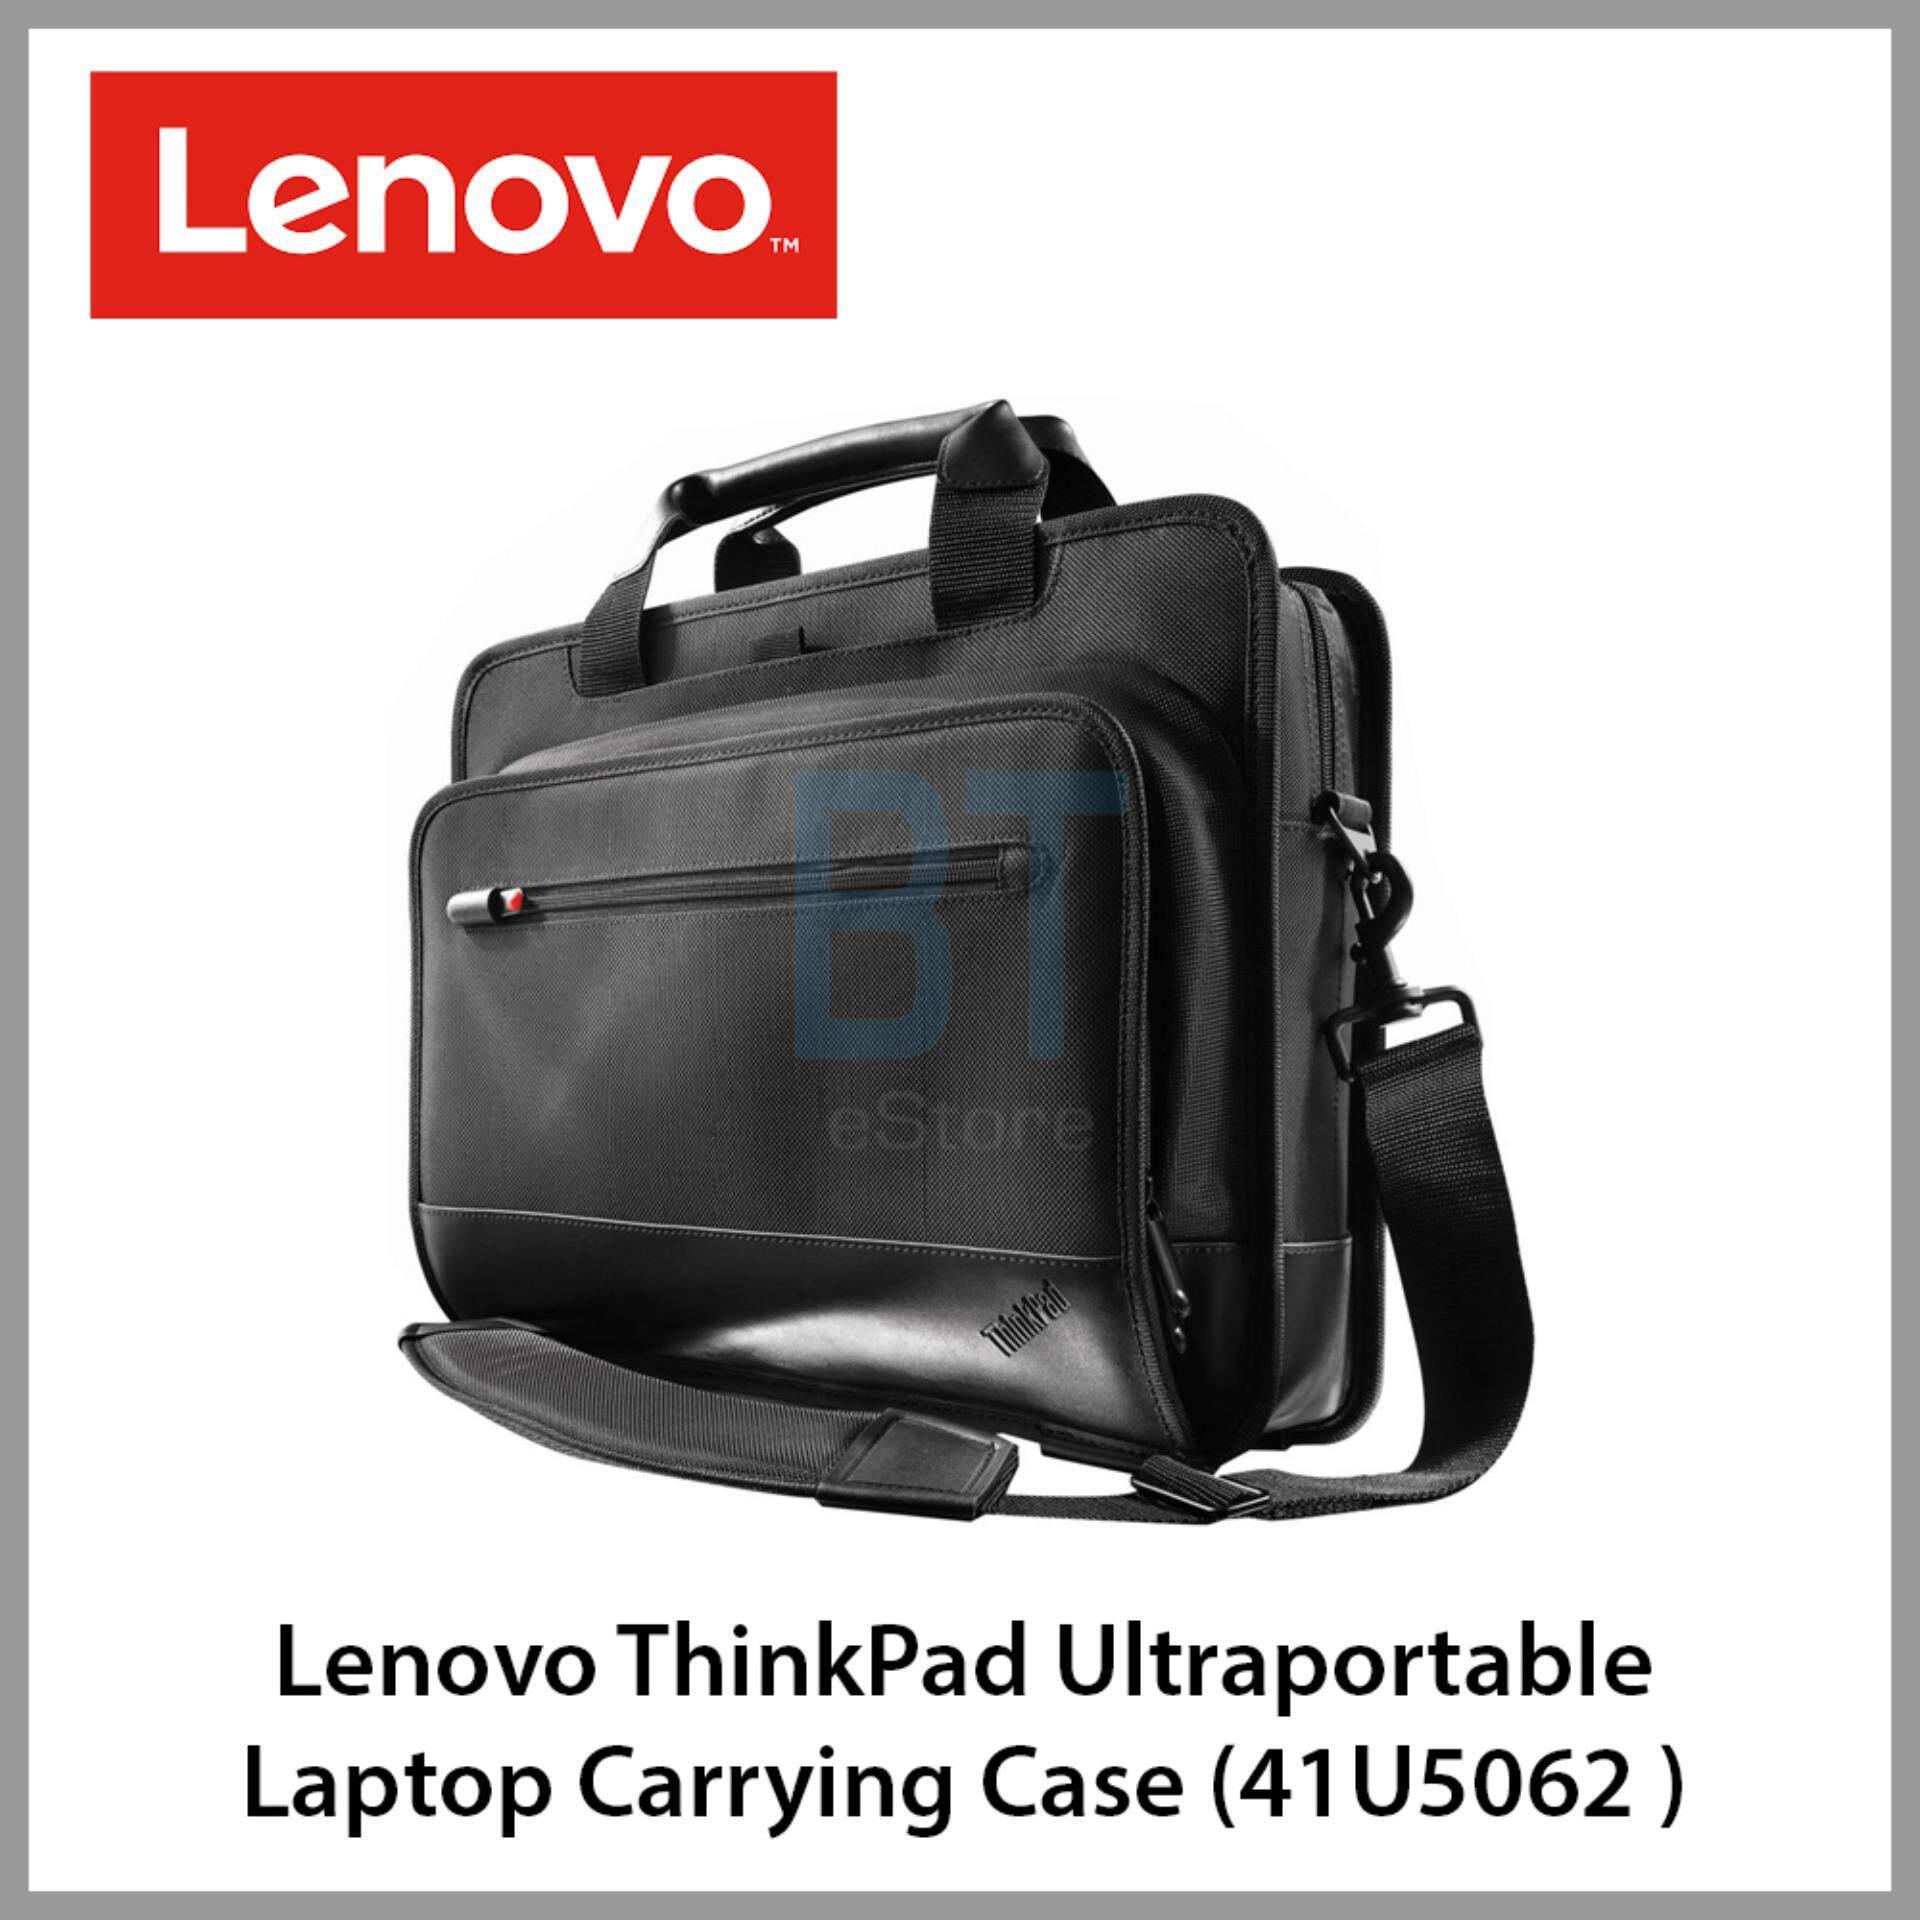 "Lenovo ThinkPad Ultraportable 13.3"" Laptop Carrying Case (41U5062) (Black)"